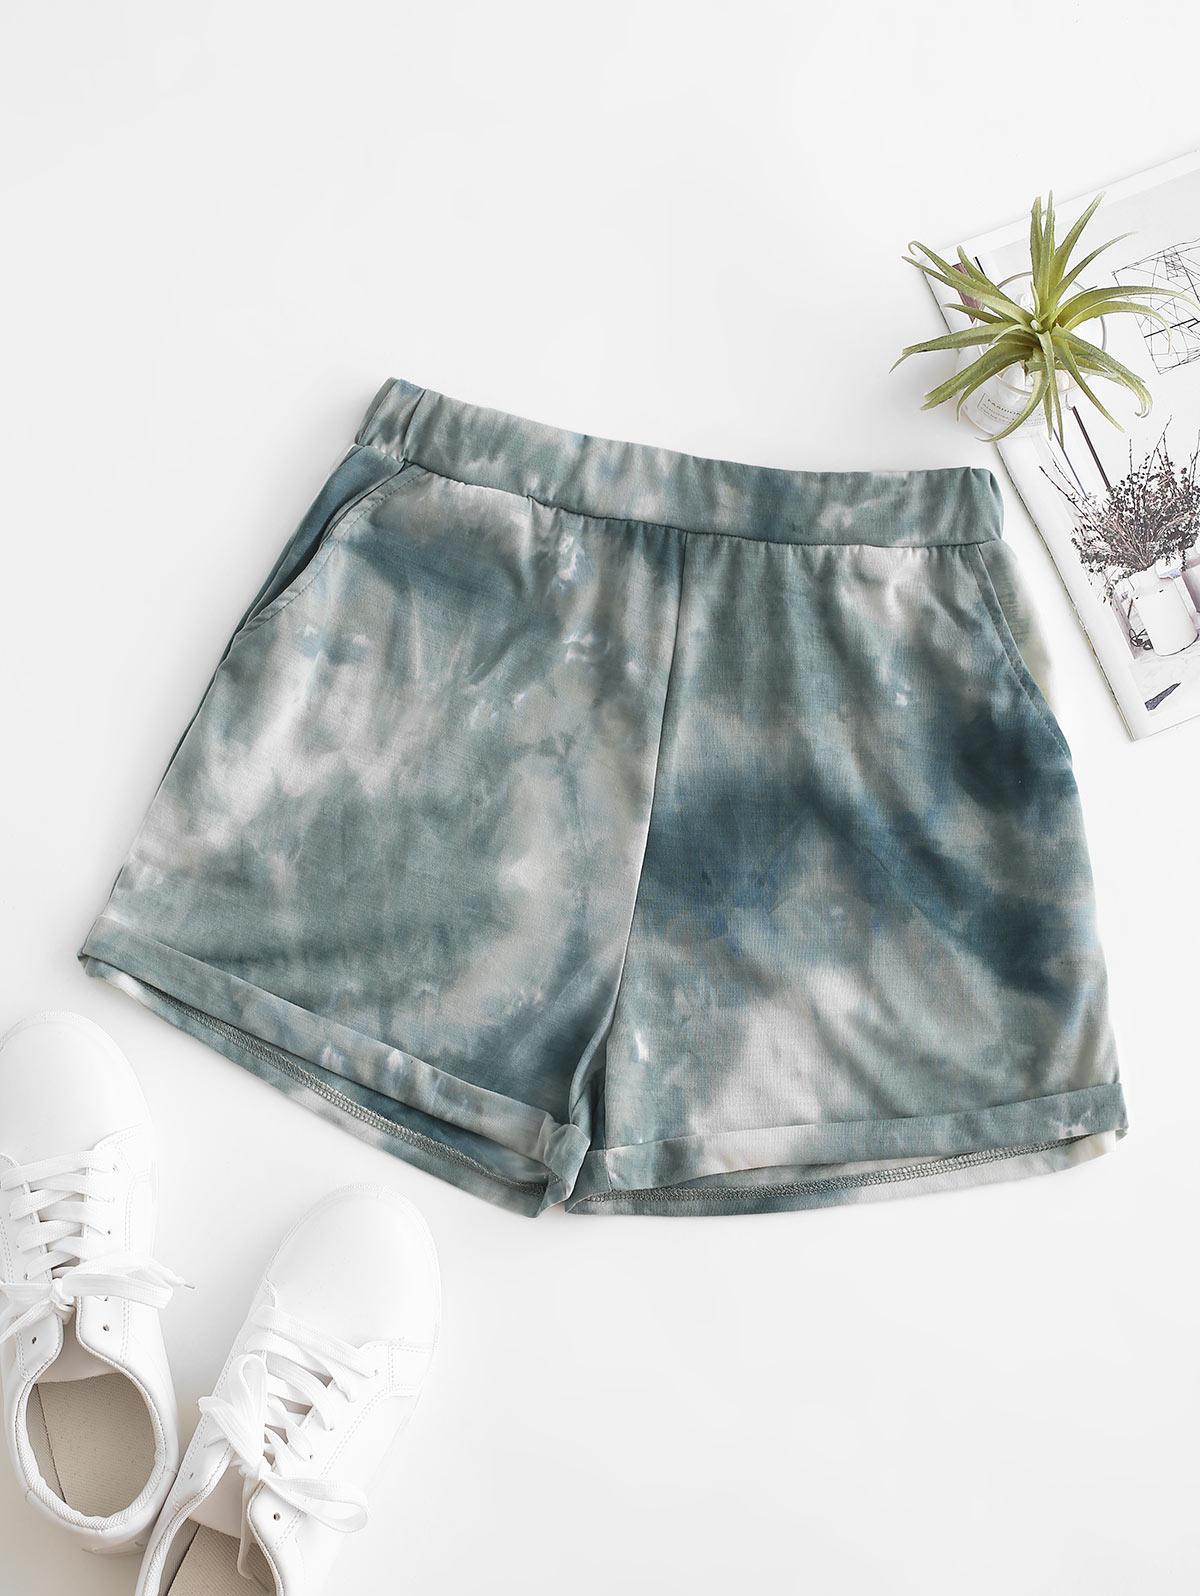 ZAFUL Pull On Pocket Tie Dye Cuffed Shorts